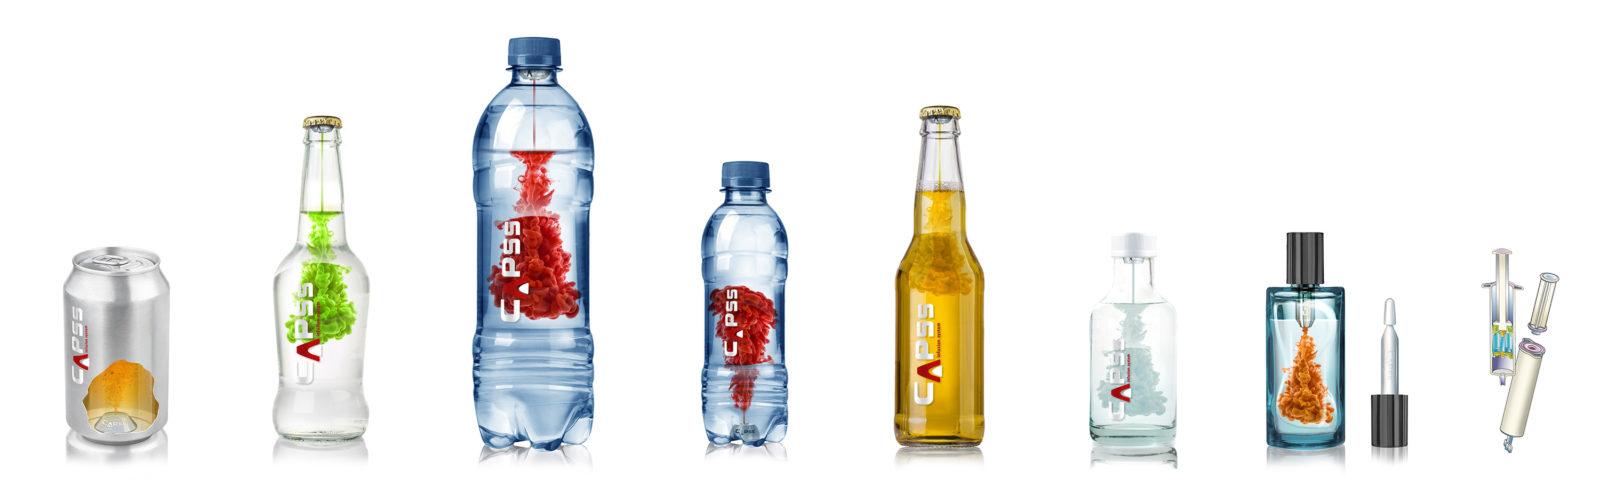 Capps_Bottle_designs_1-1600x501